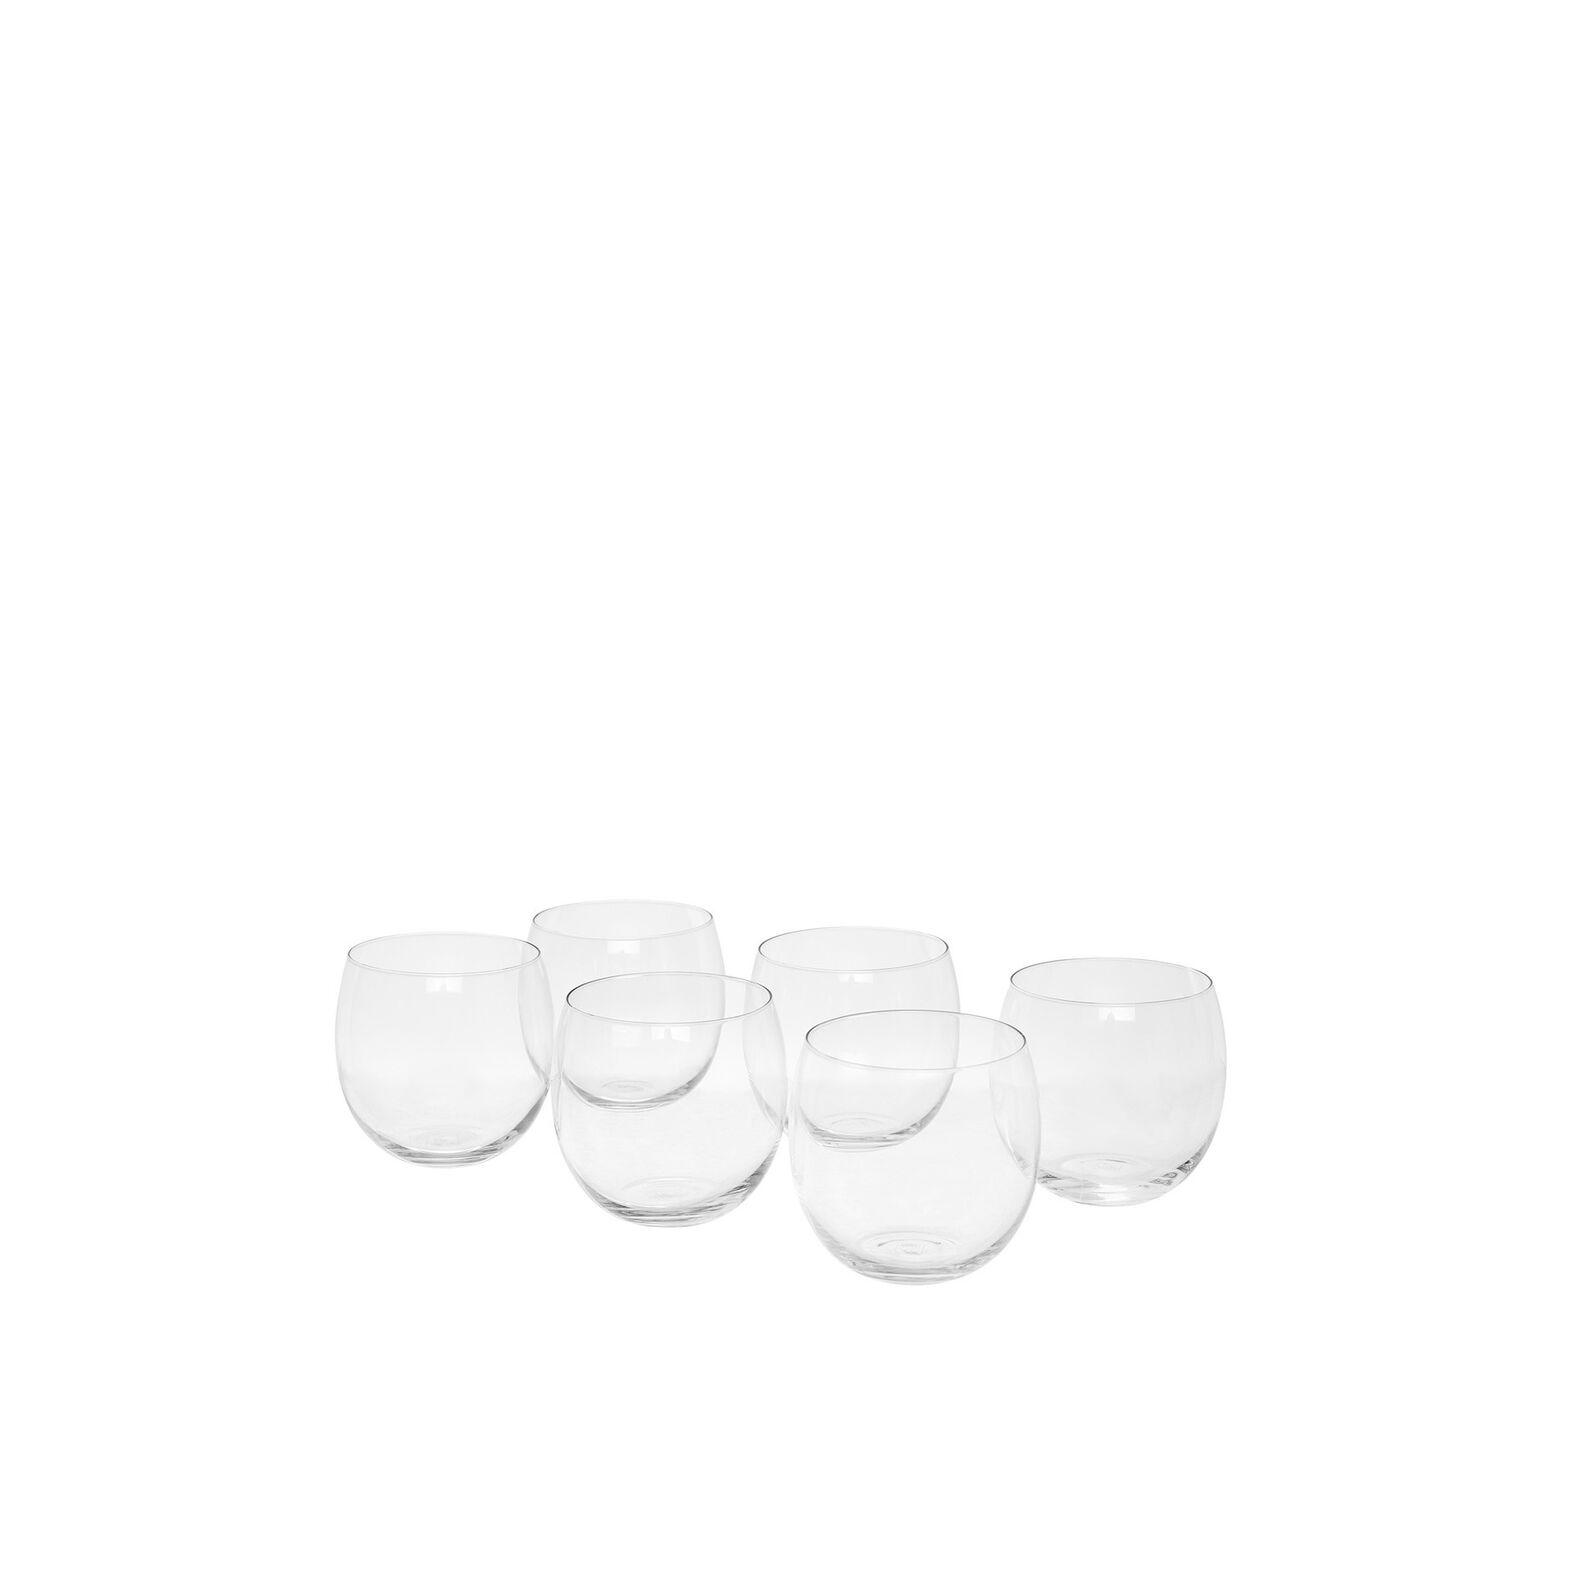 Set of 6 Bubbly shot glasses